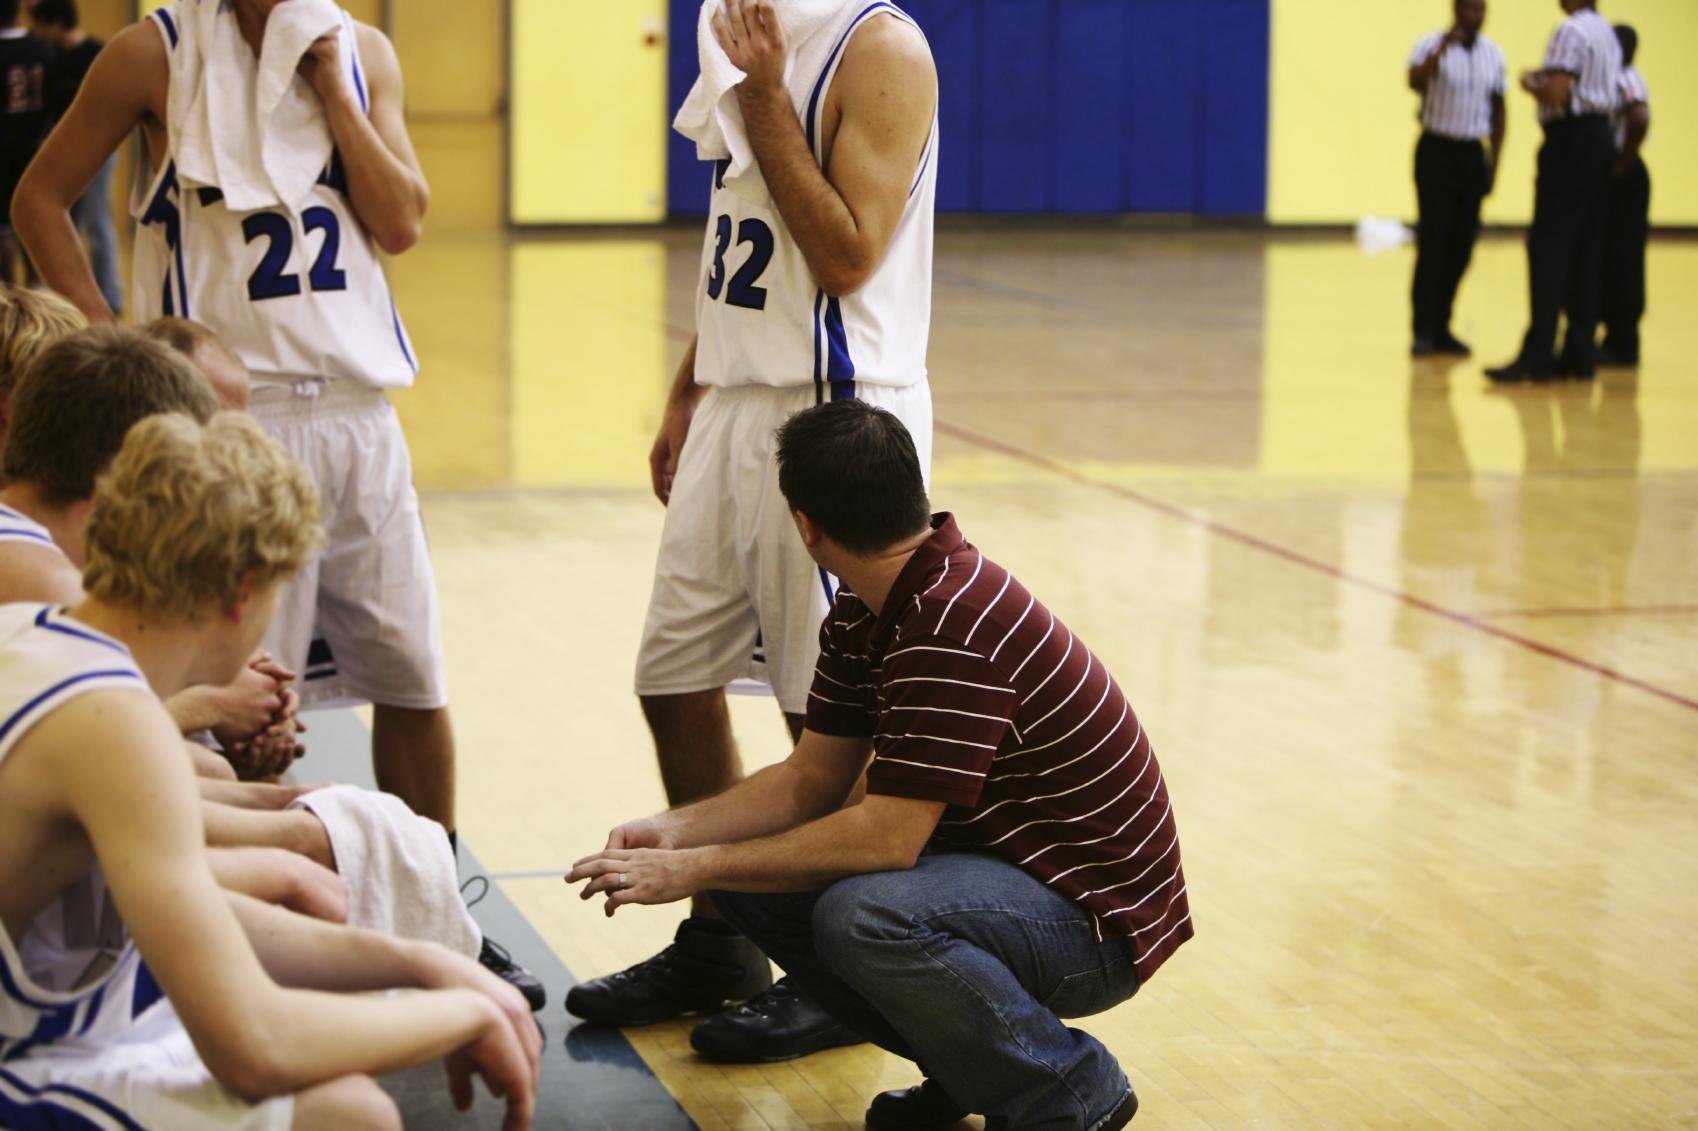 Traits of a Good Coach